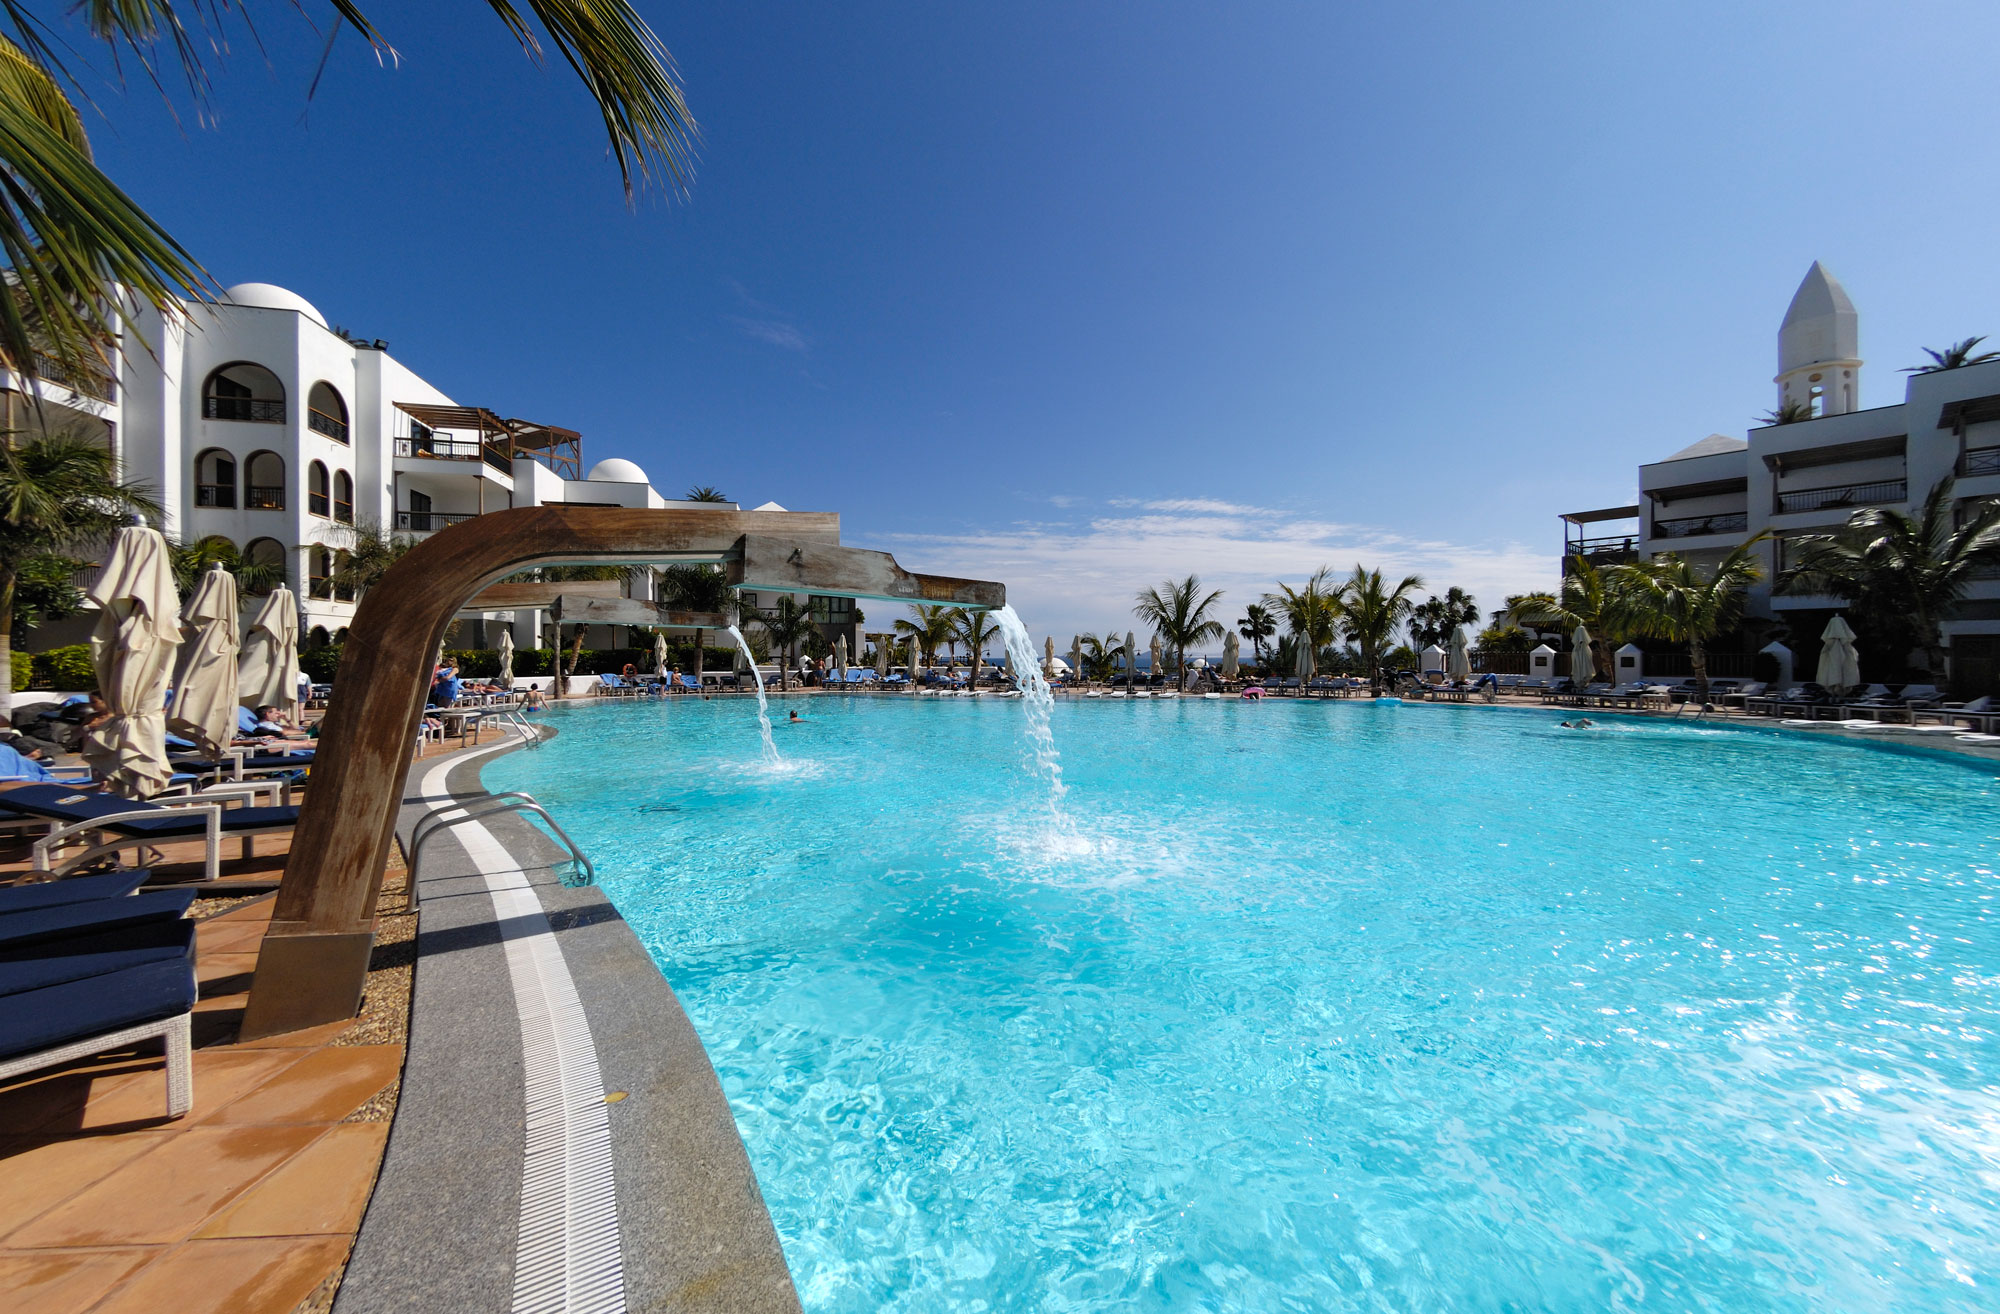 Show-Stopping Food At Lanzarote's Princesa Yaiza Suite Resort 4